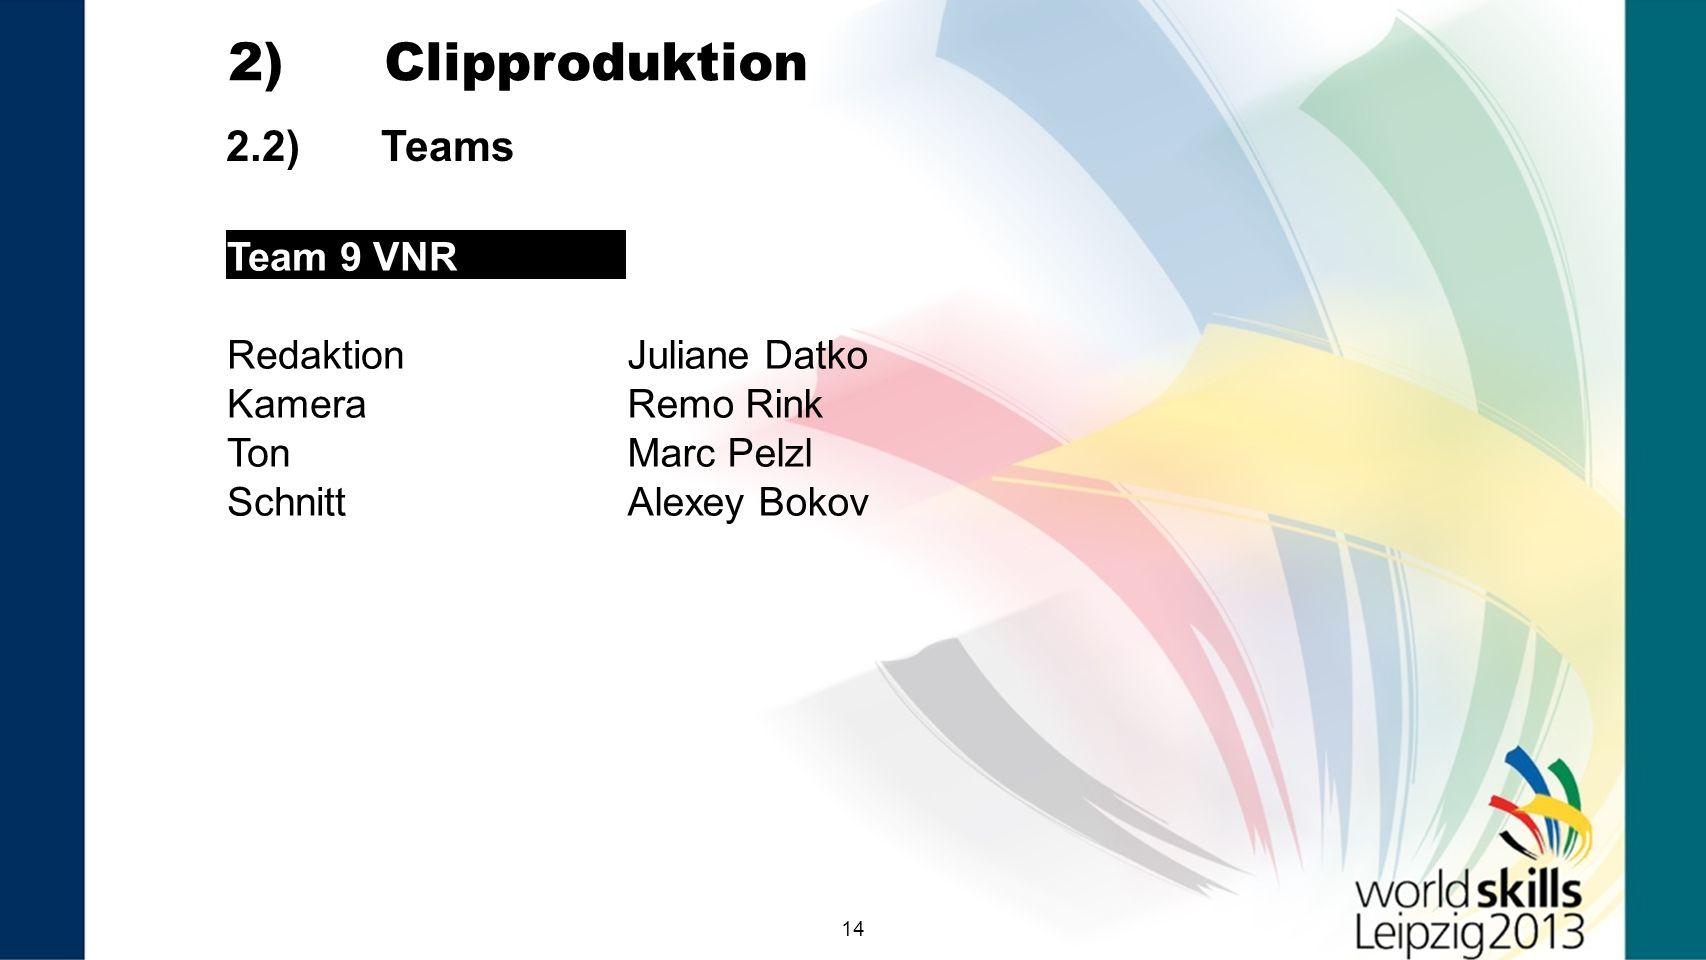 14 2.2) Teams 2) Clipproduktion Team 9 VNR RedaktionJuliane Datko KameraRemo Rink TonMarc Pelzl SchnittAlexey Bokov Team 9 VNR